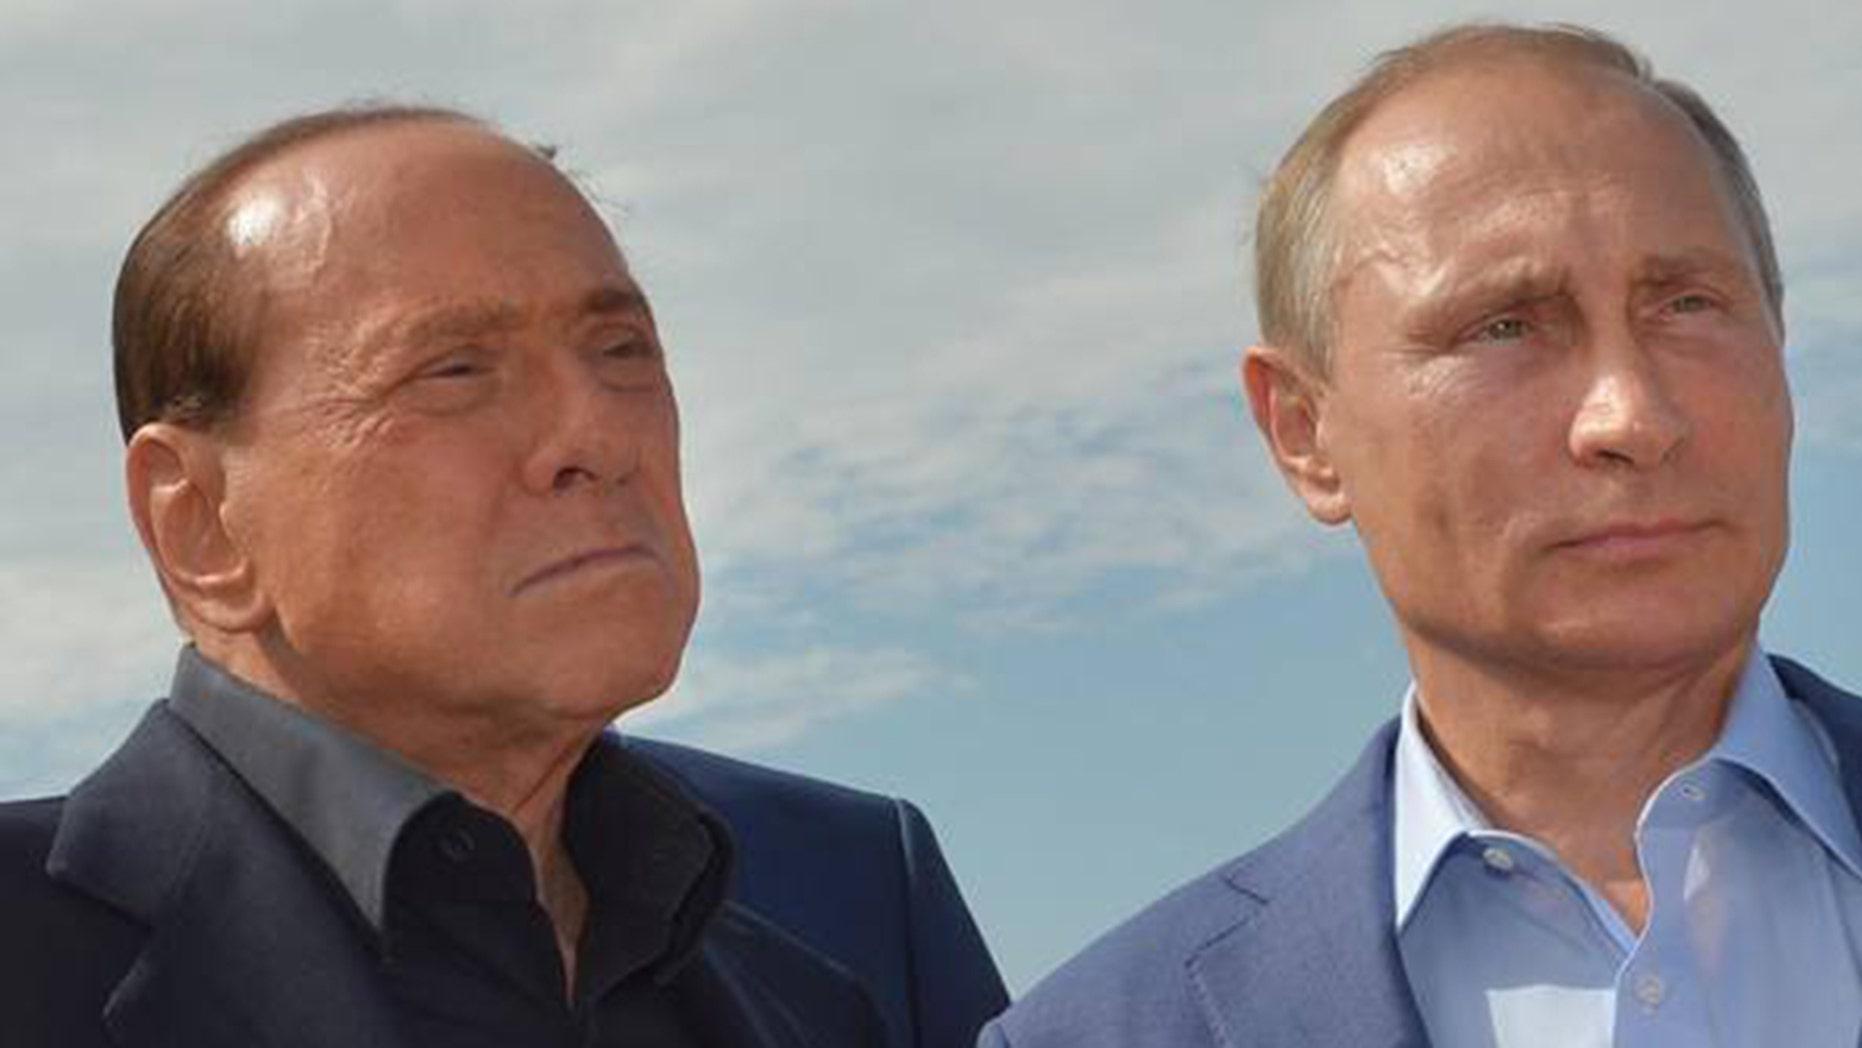 Russian president Vladimir Putin, right, and former Italian prime minister Silvio Berlusconi.